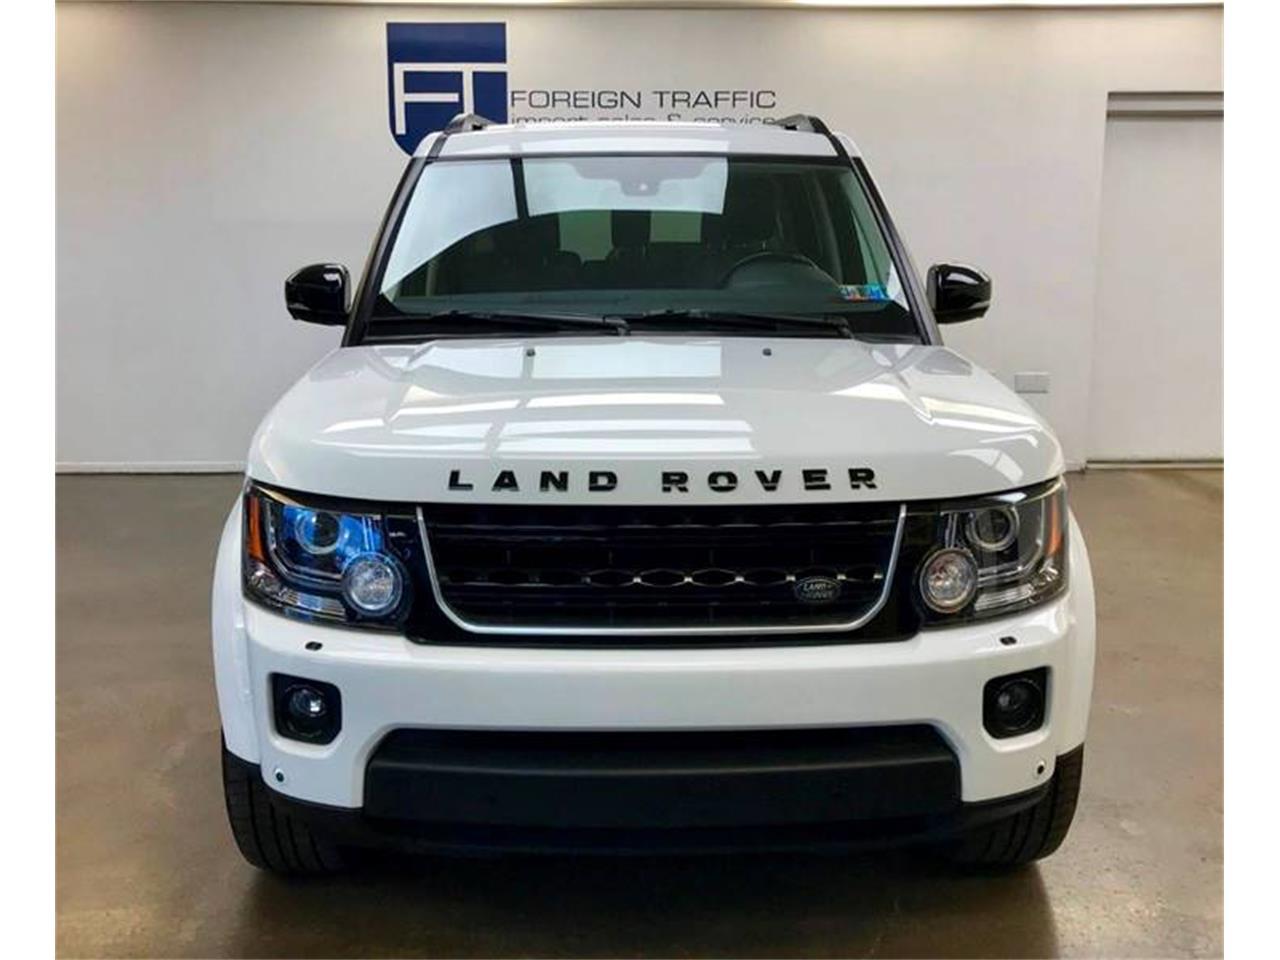 2016 Land Rover LR4 (CC-1179895) for sale in Allison Park, Pennsylvania